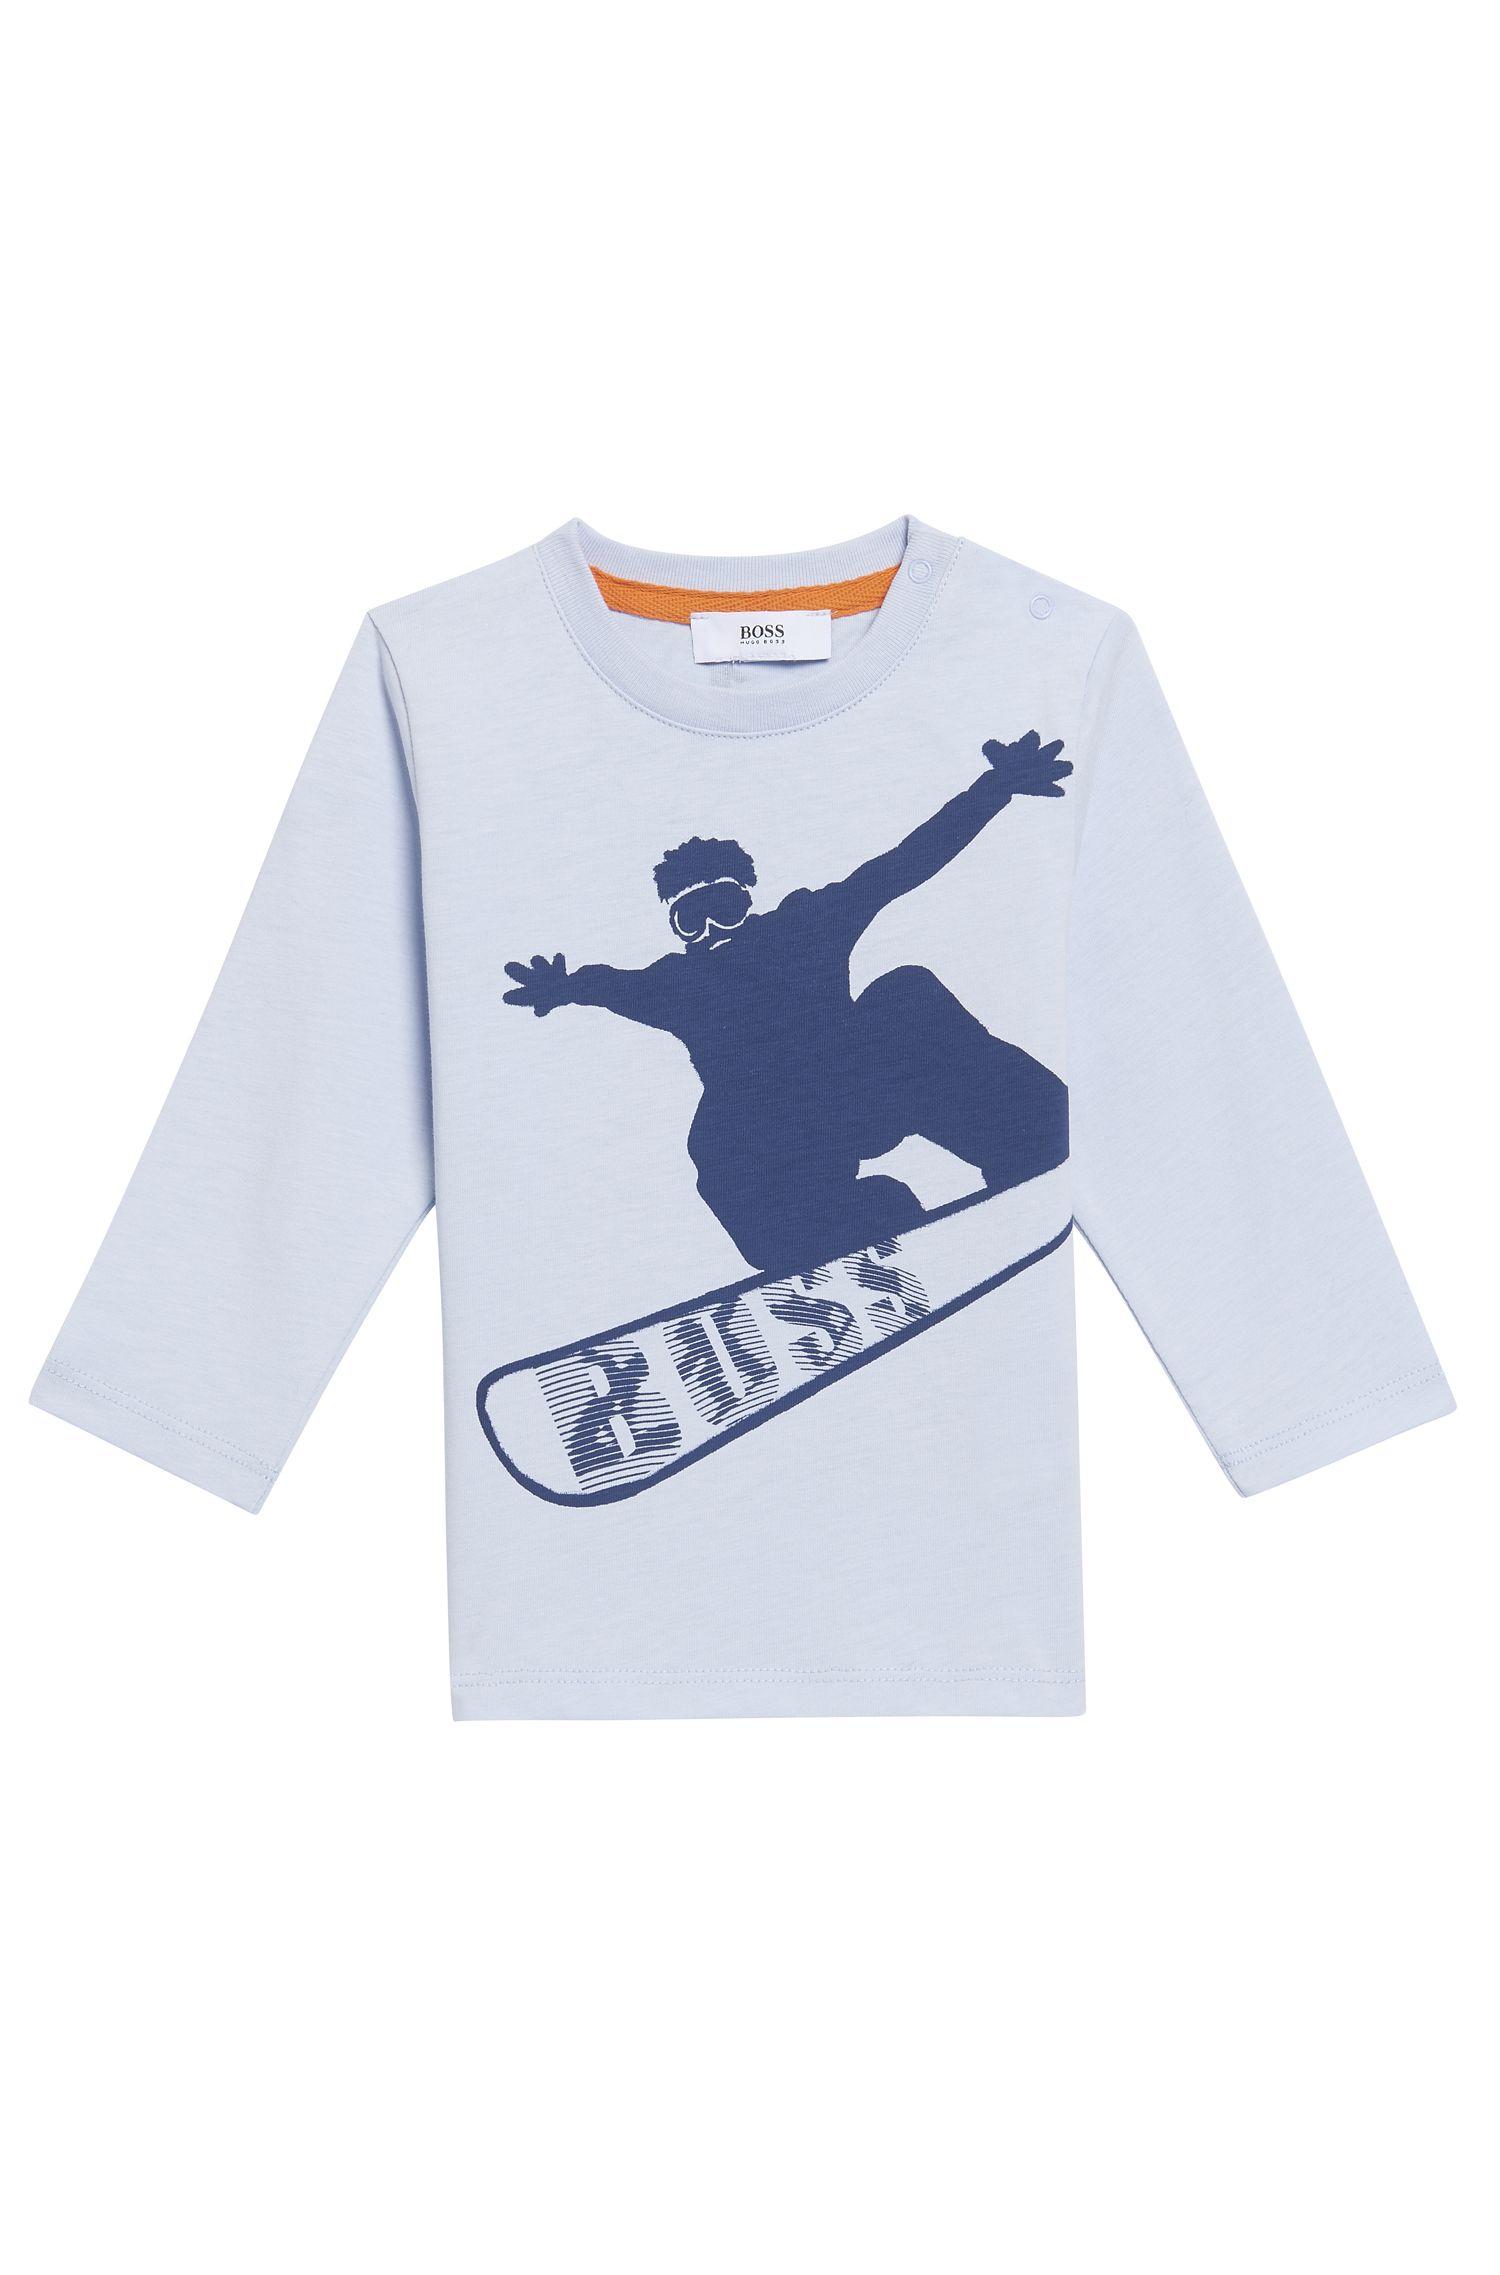 'J05504' | Toddler Stretch Cotton Blend Long Sleeve T-Shirt